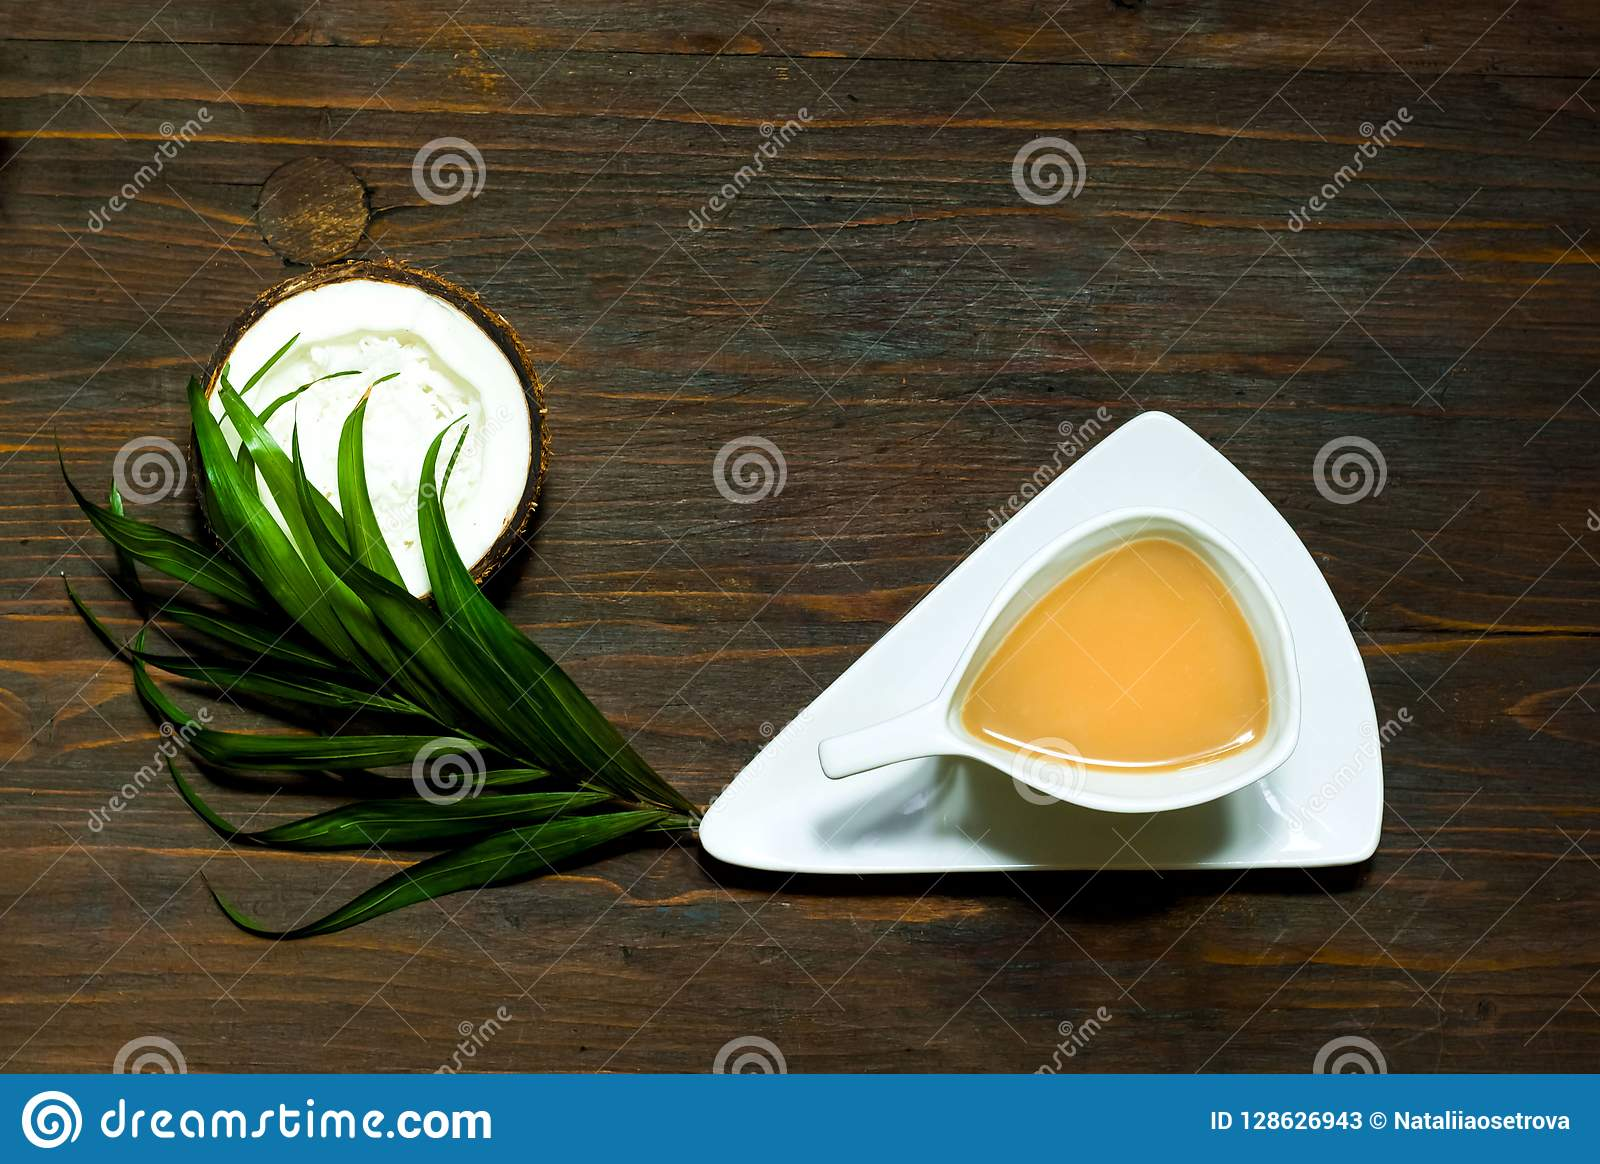 Masala医治用的茶用在白色葡萄酒杯子的椰奶在木背景,素食主义者食谱概念,拷贝空间,